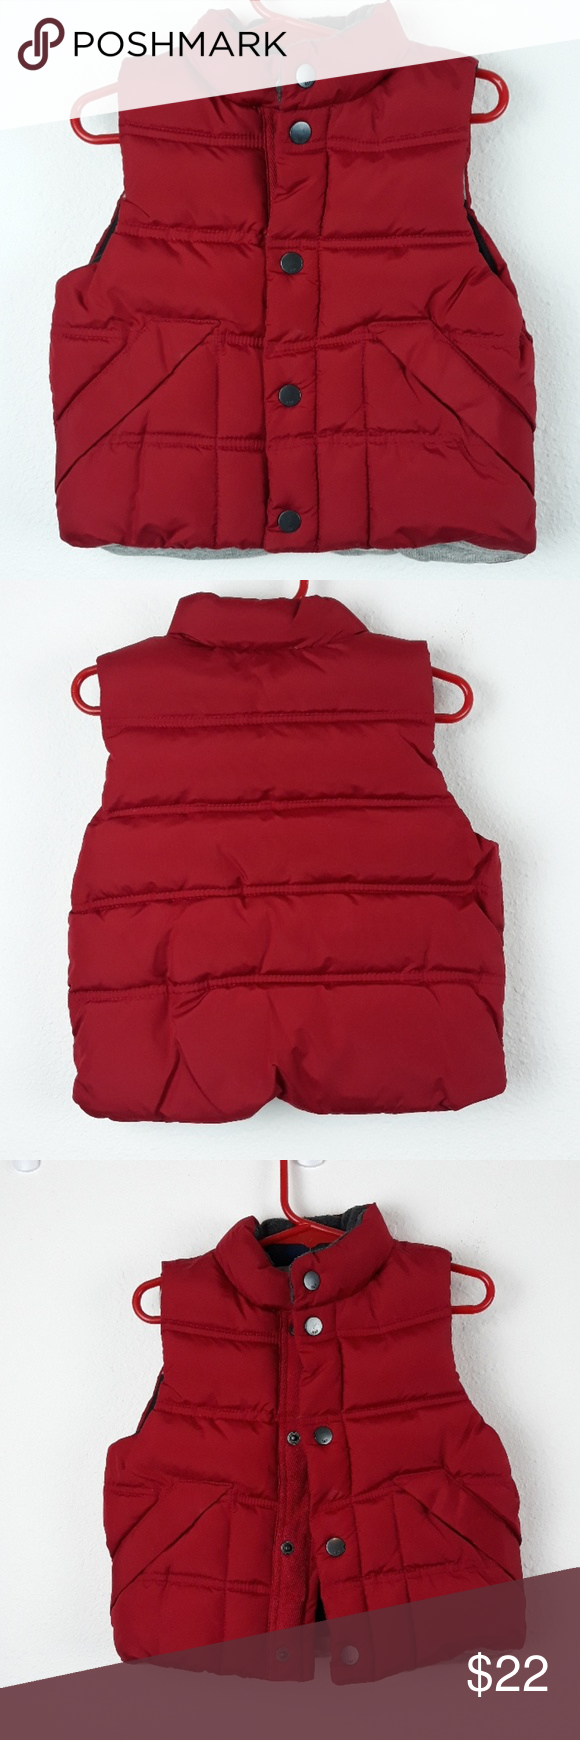 f051ecba5 Babygap thick puffer vest size 12-18 months in 2018